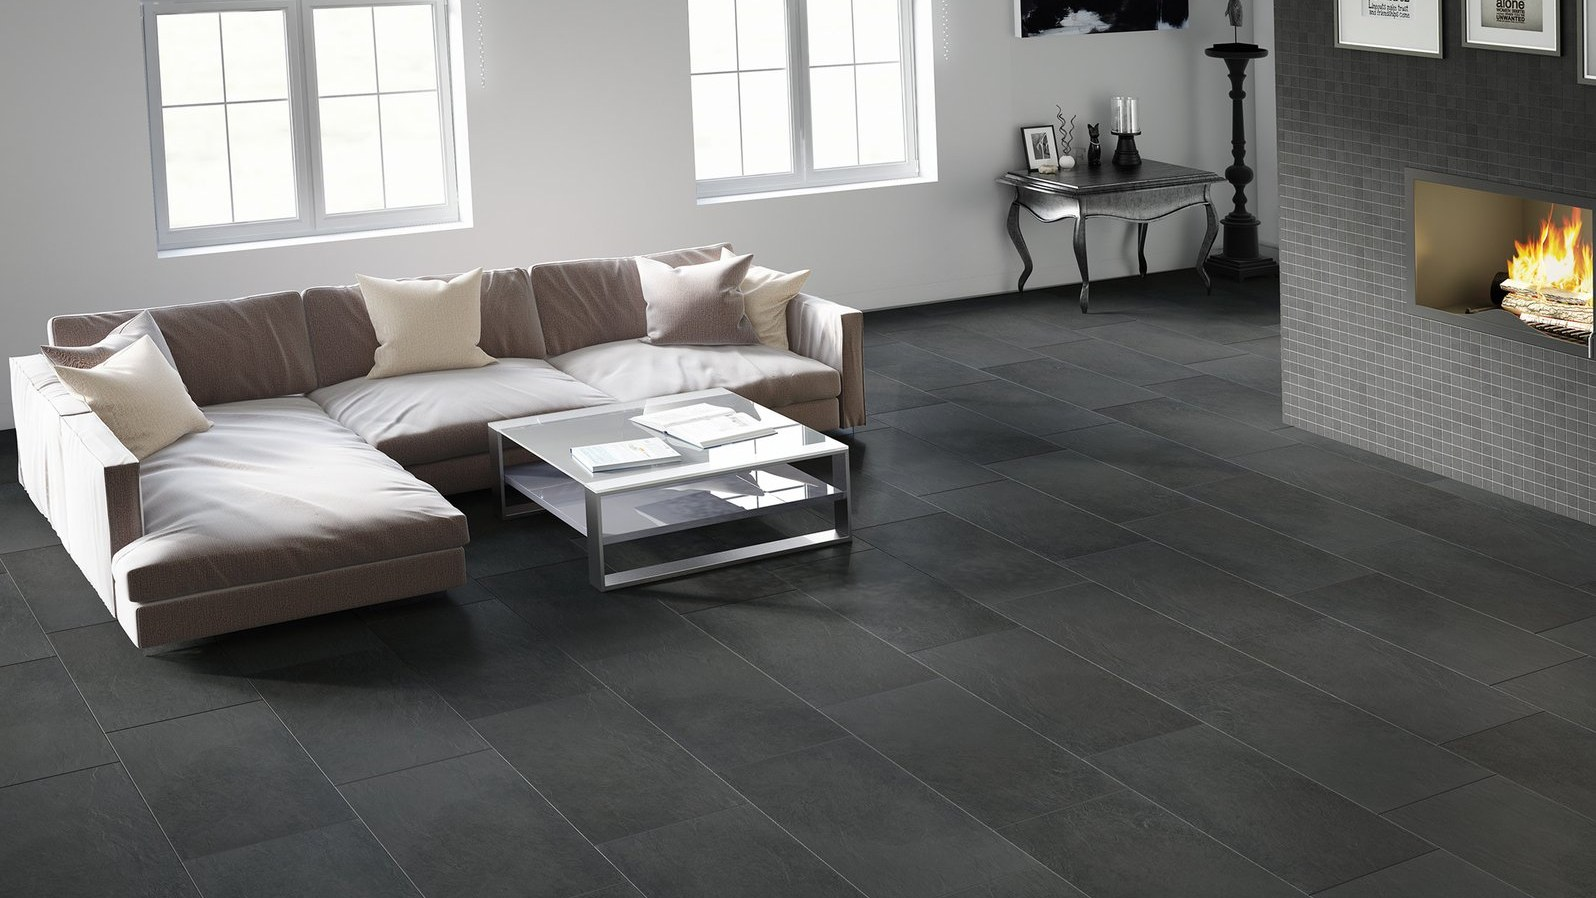 carrelage effet beton gris anthracite promo aubagne bouches du rhone livraison pose carrelage vente